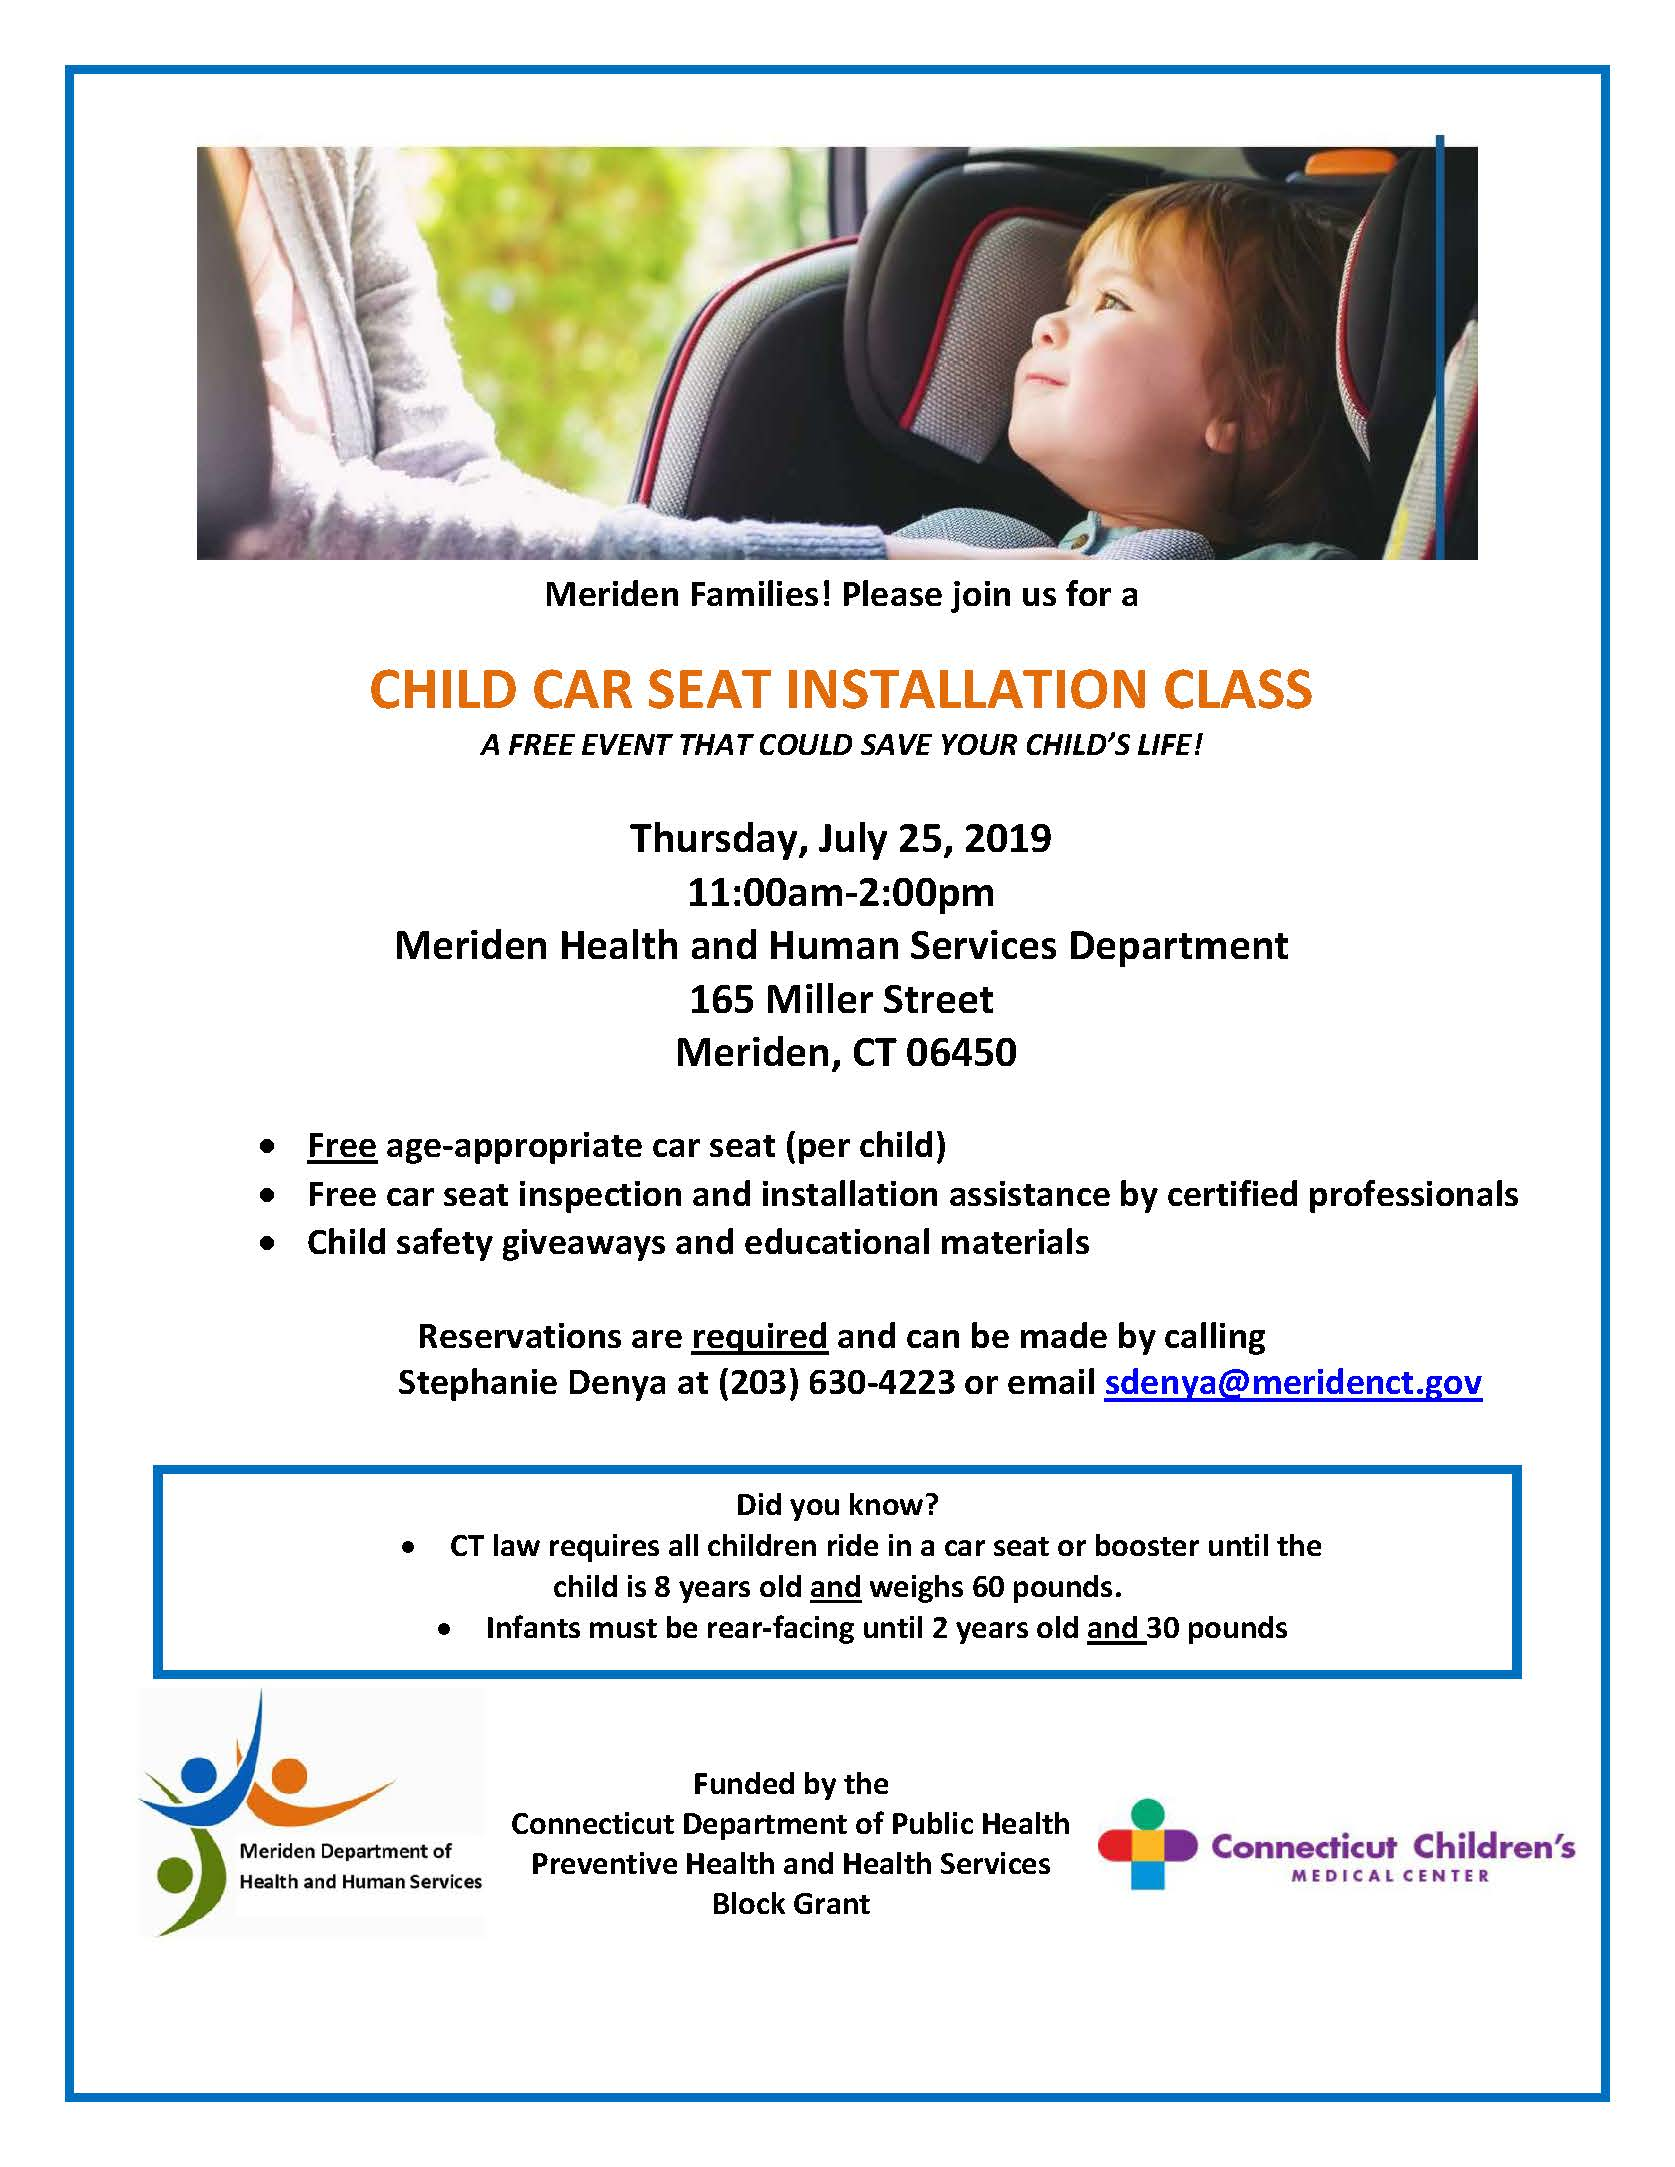 Child Car Seat Installation Class